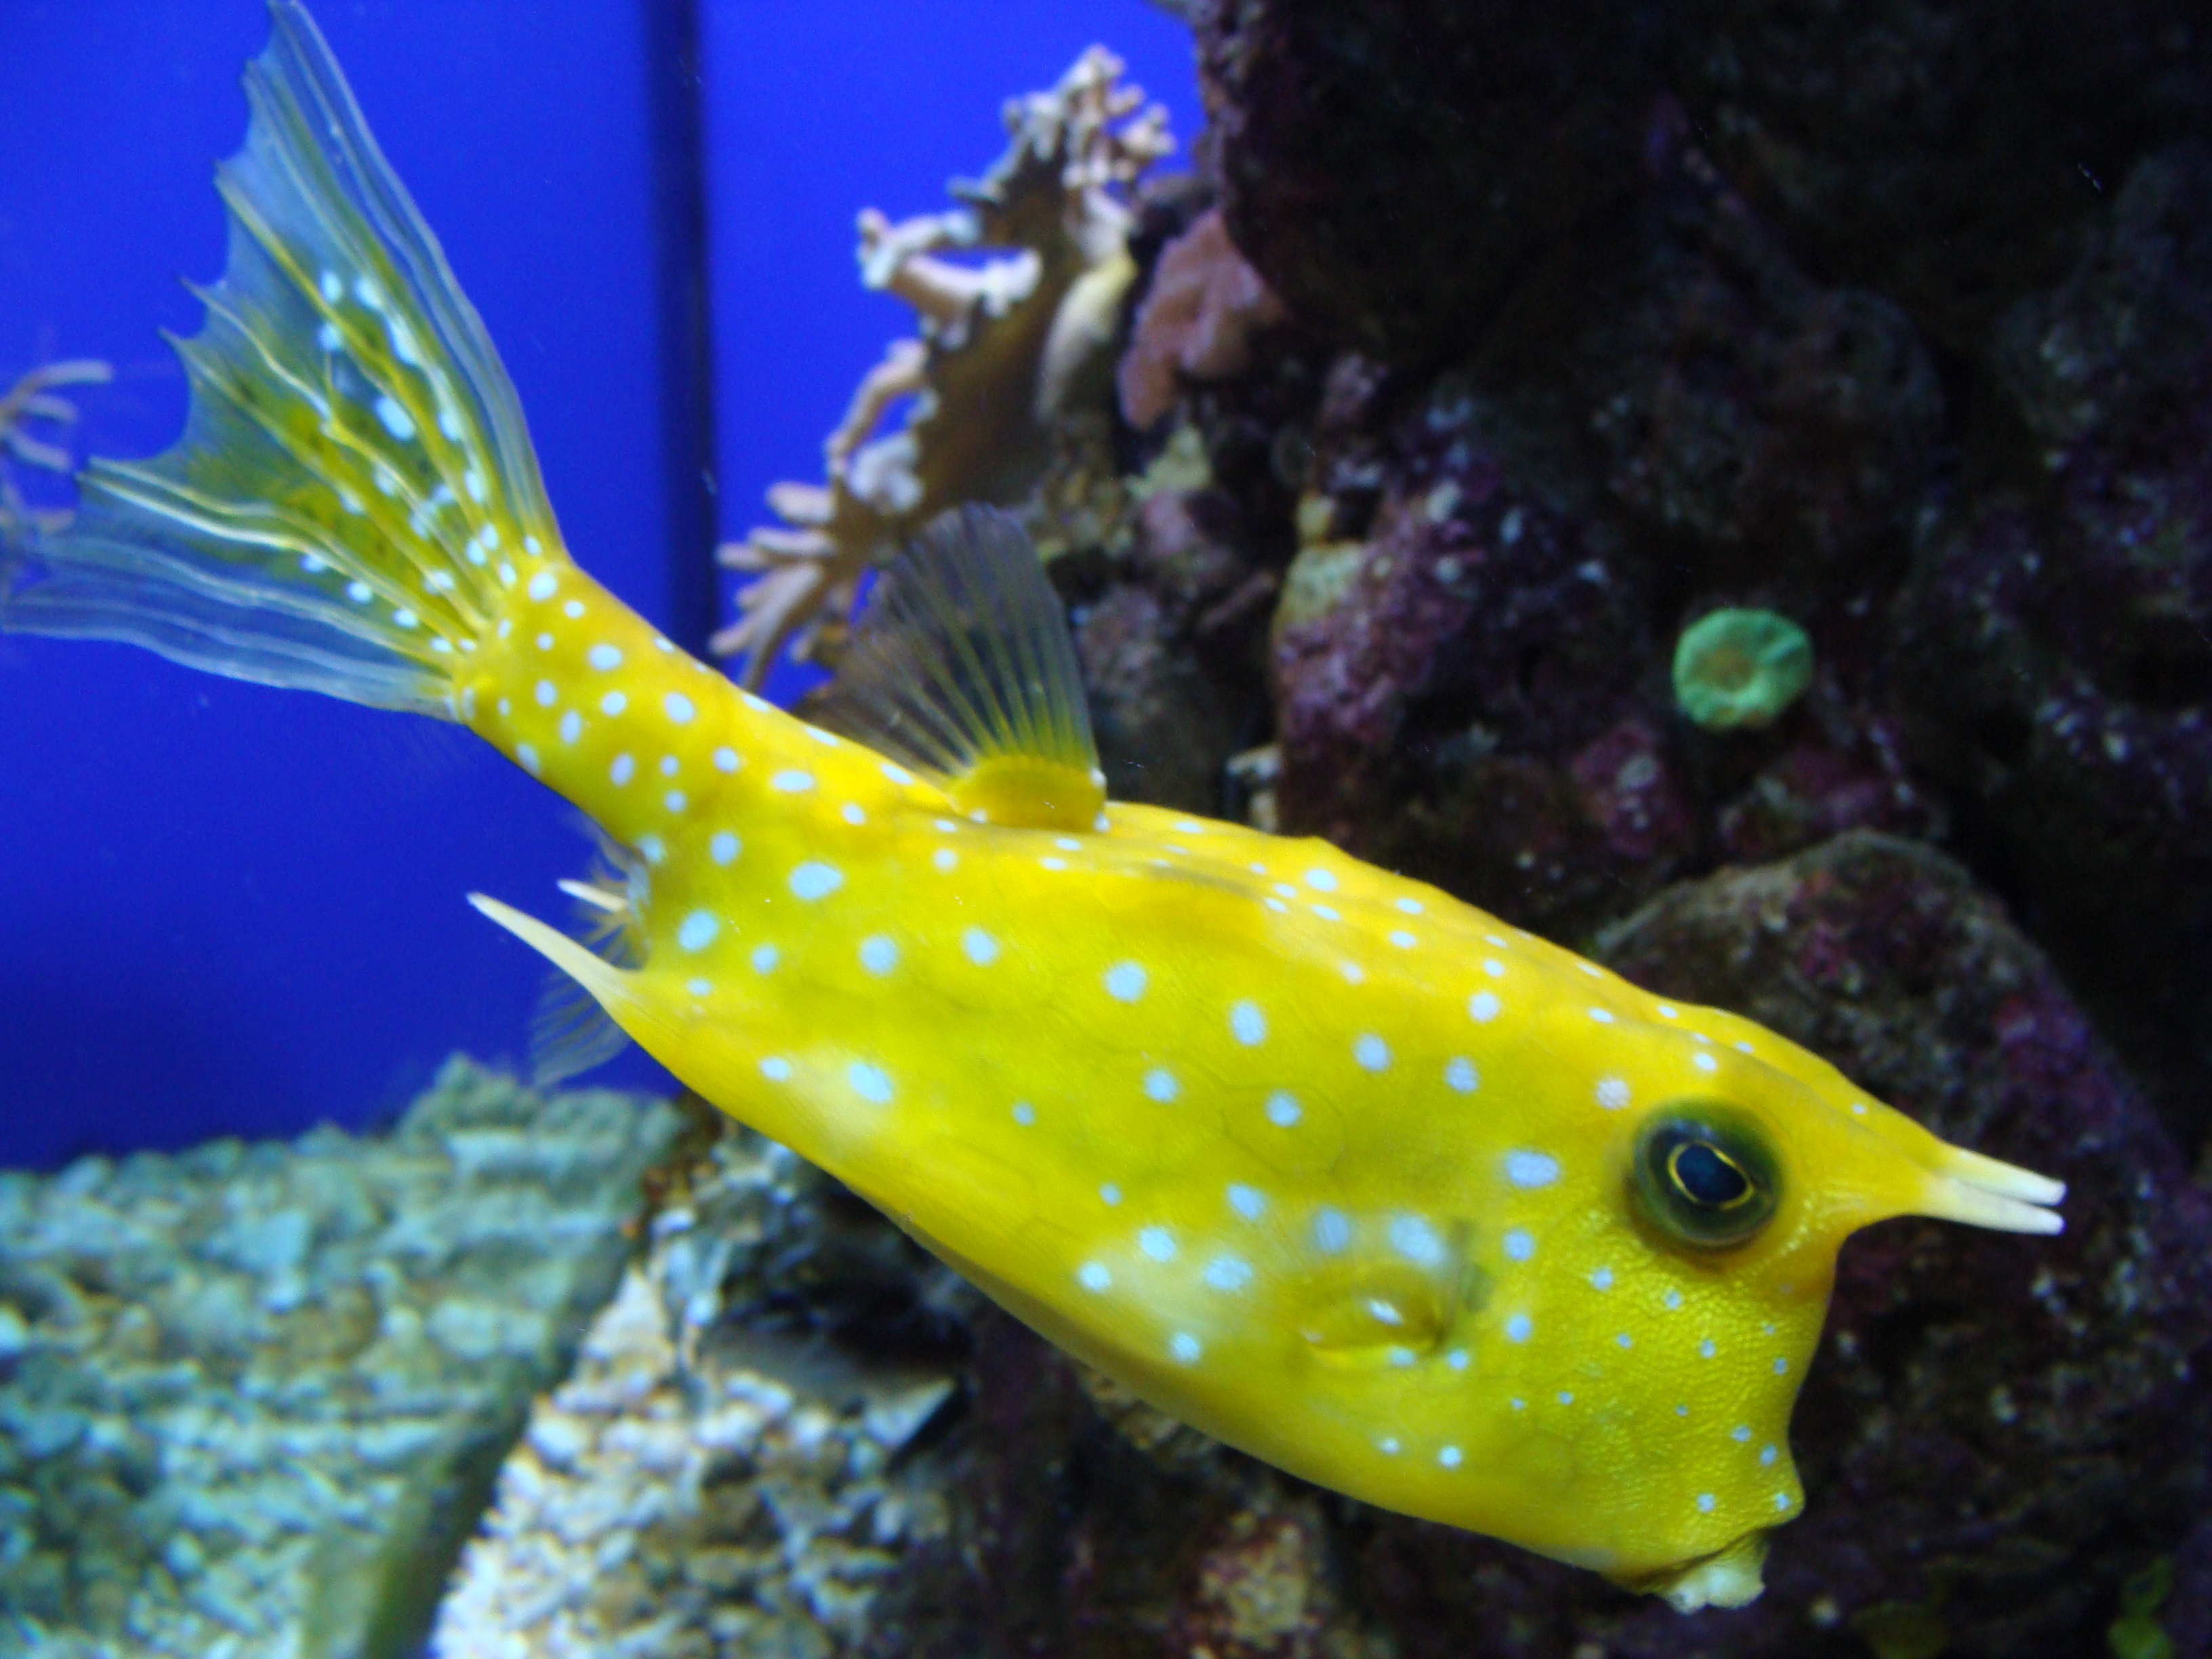 File:Lactoria cornuta.002 - Aquarium Finisterrae.JPG - Wikipedia